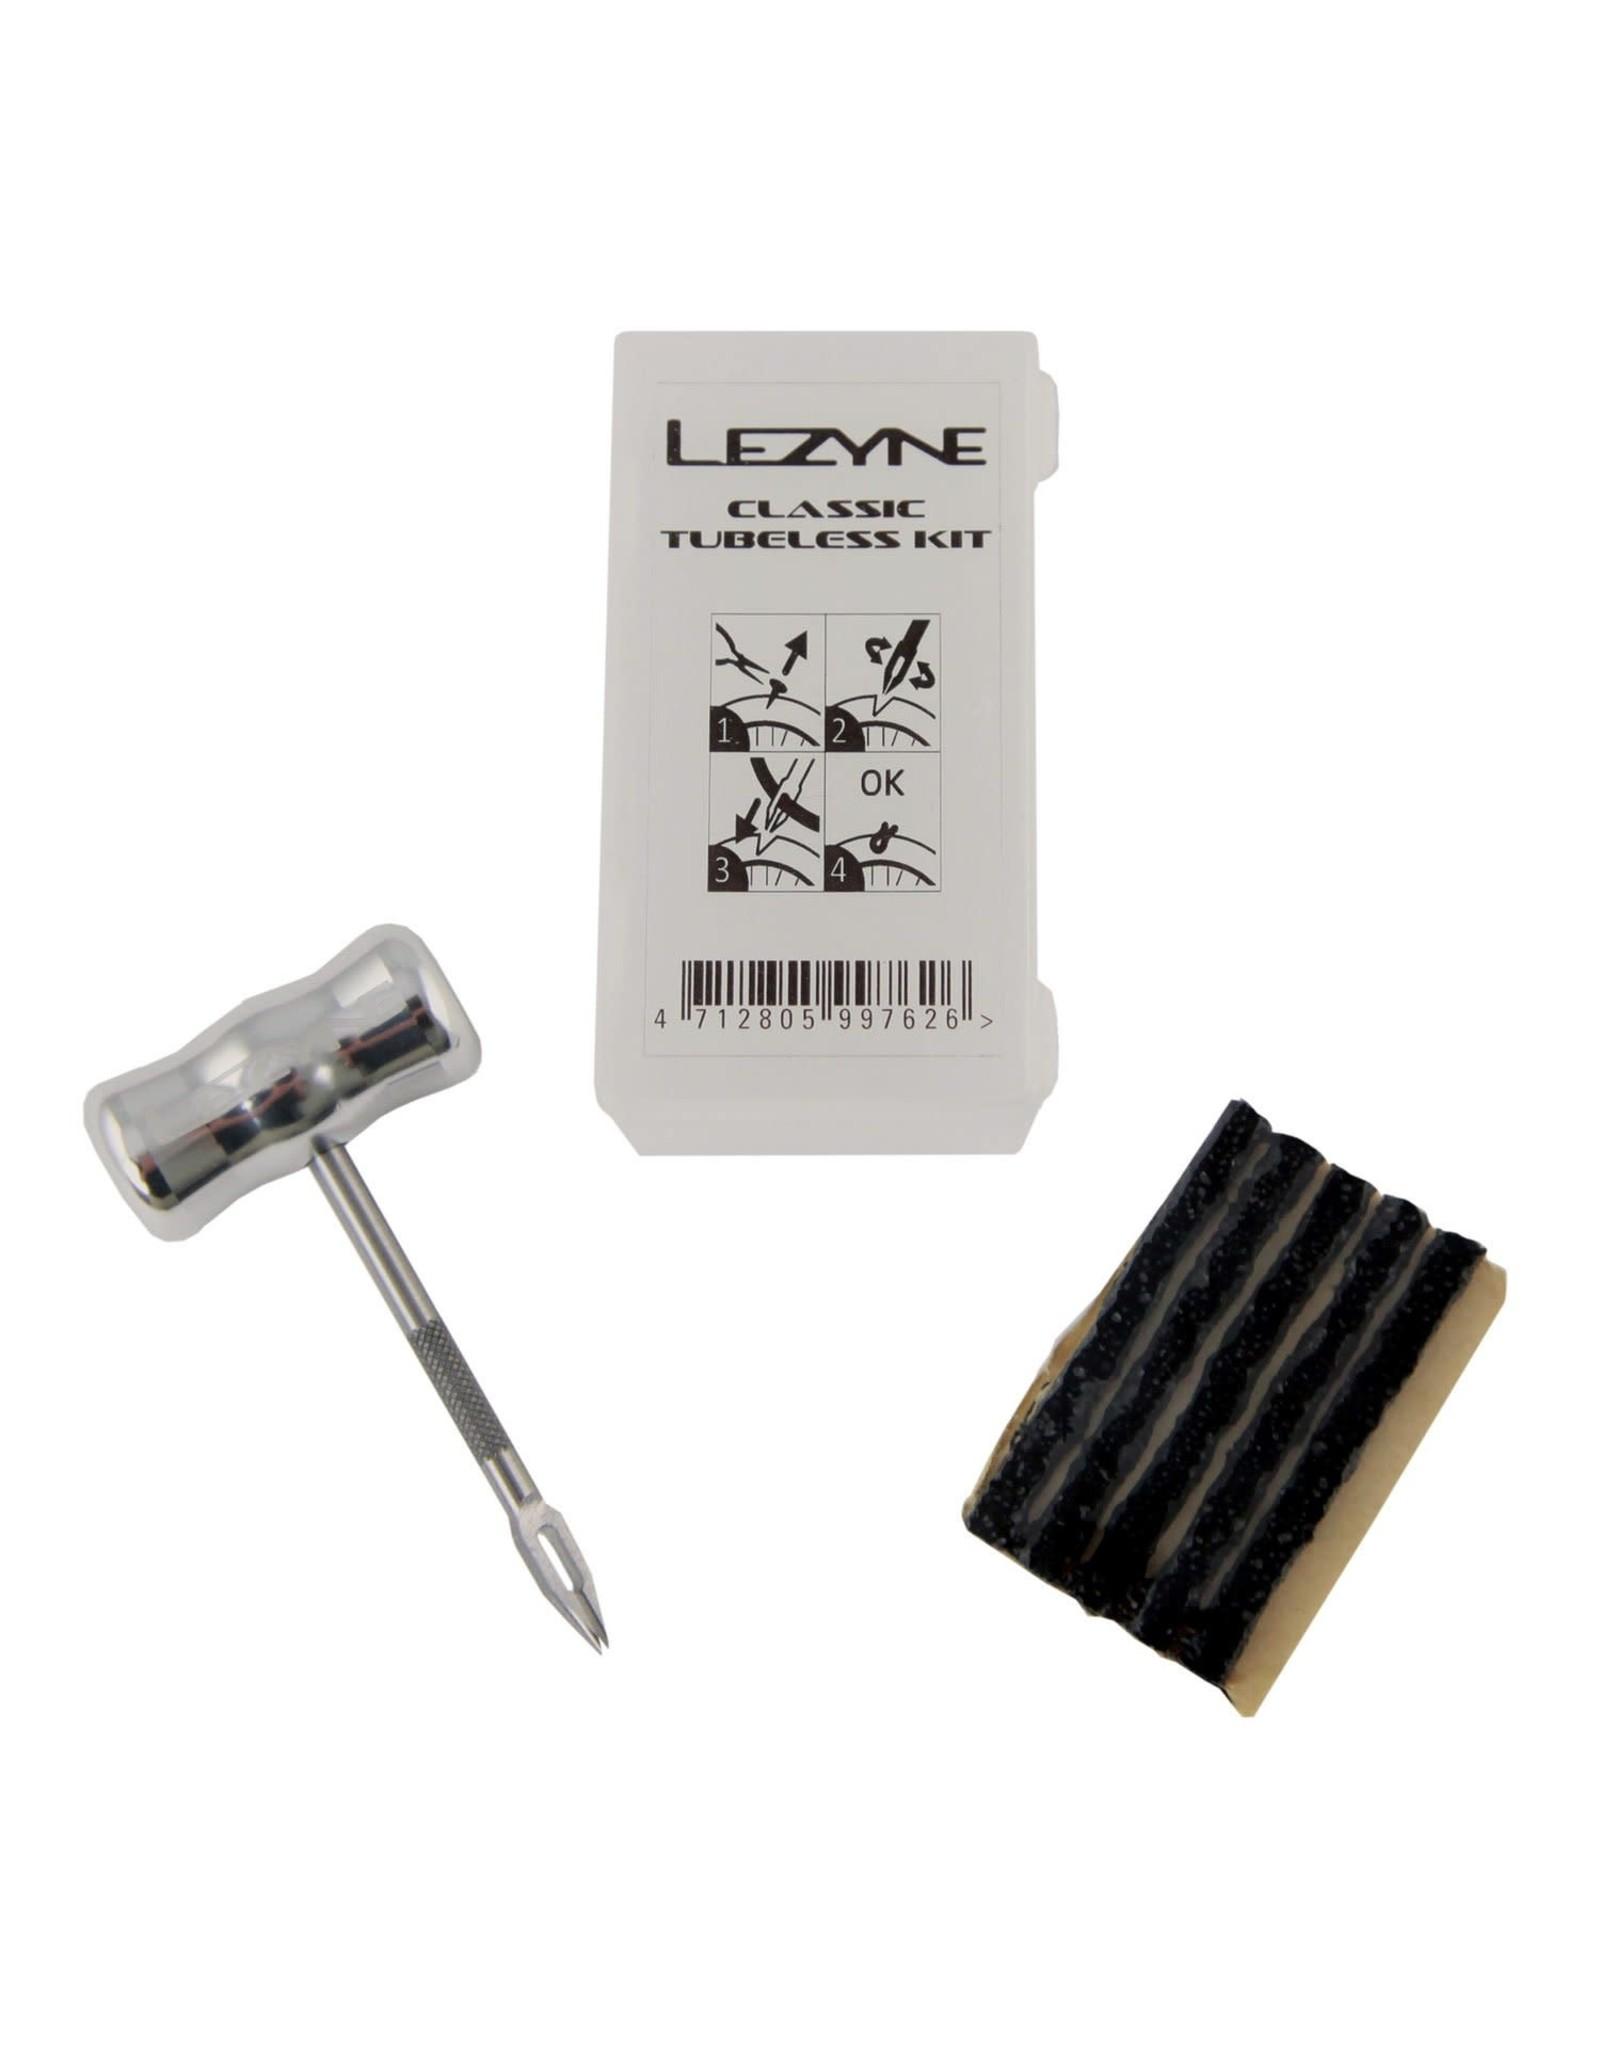 Lezyne - Classic Tubeless Kit